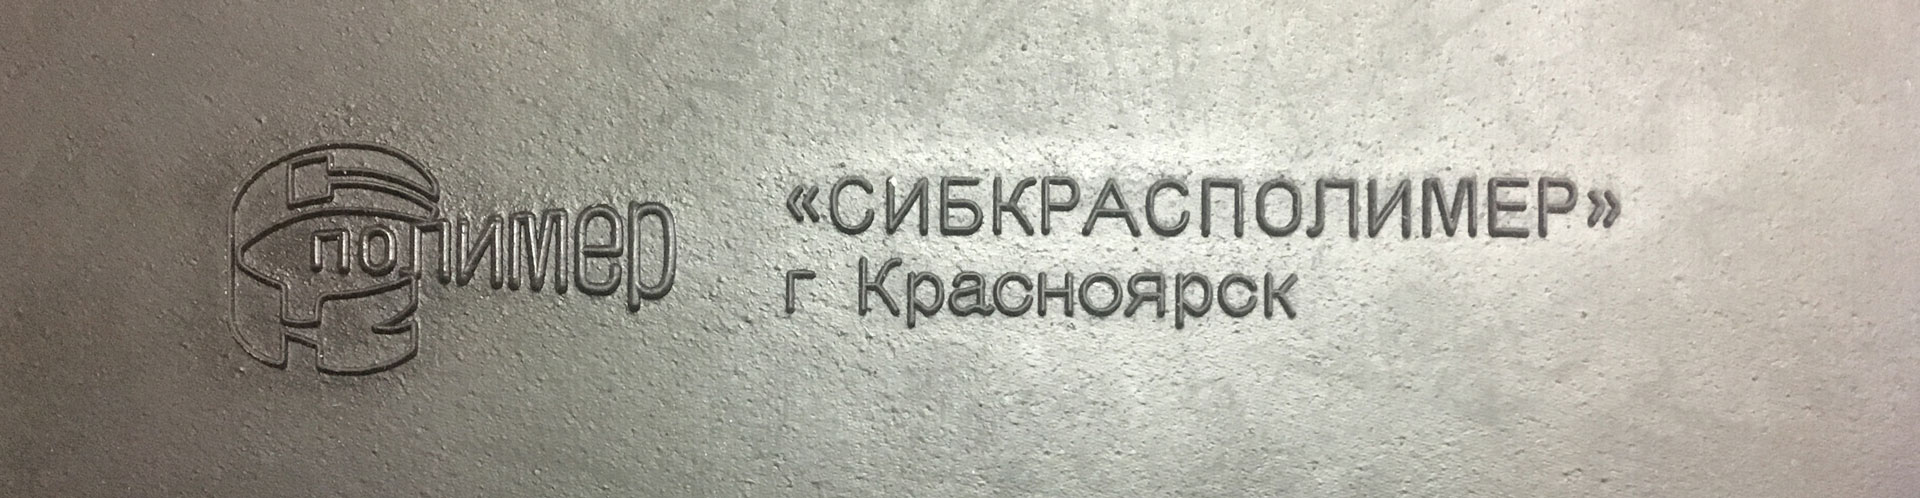 Логотип на проступях